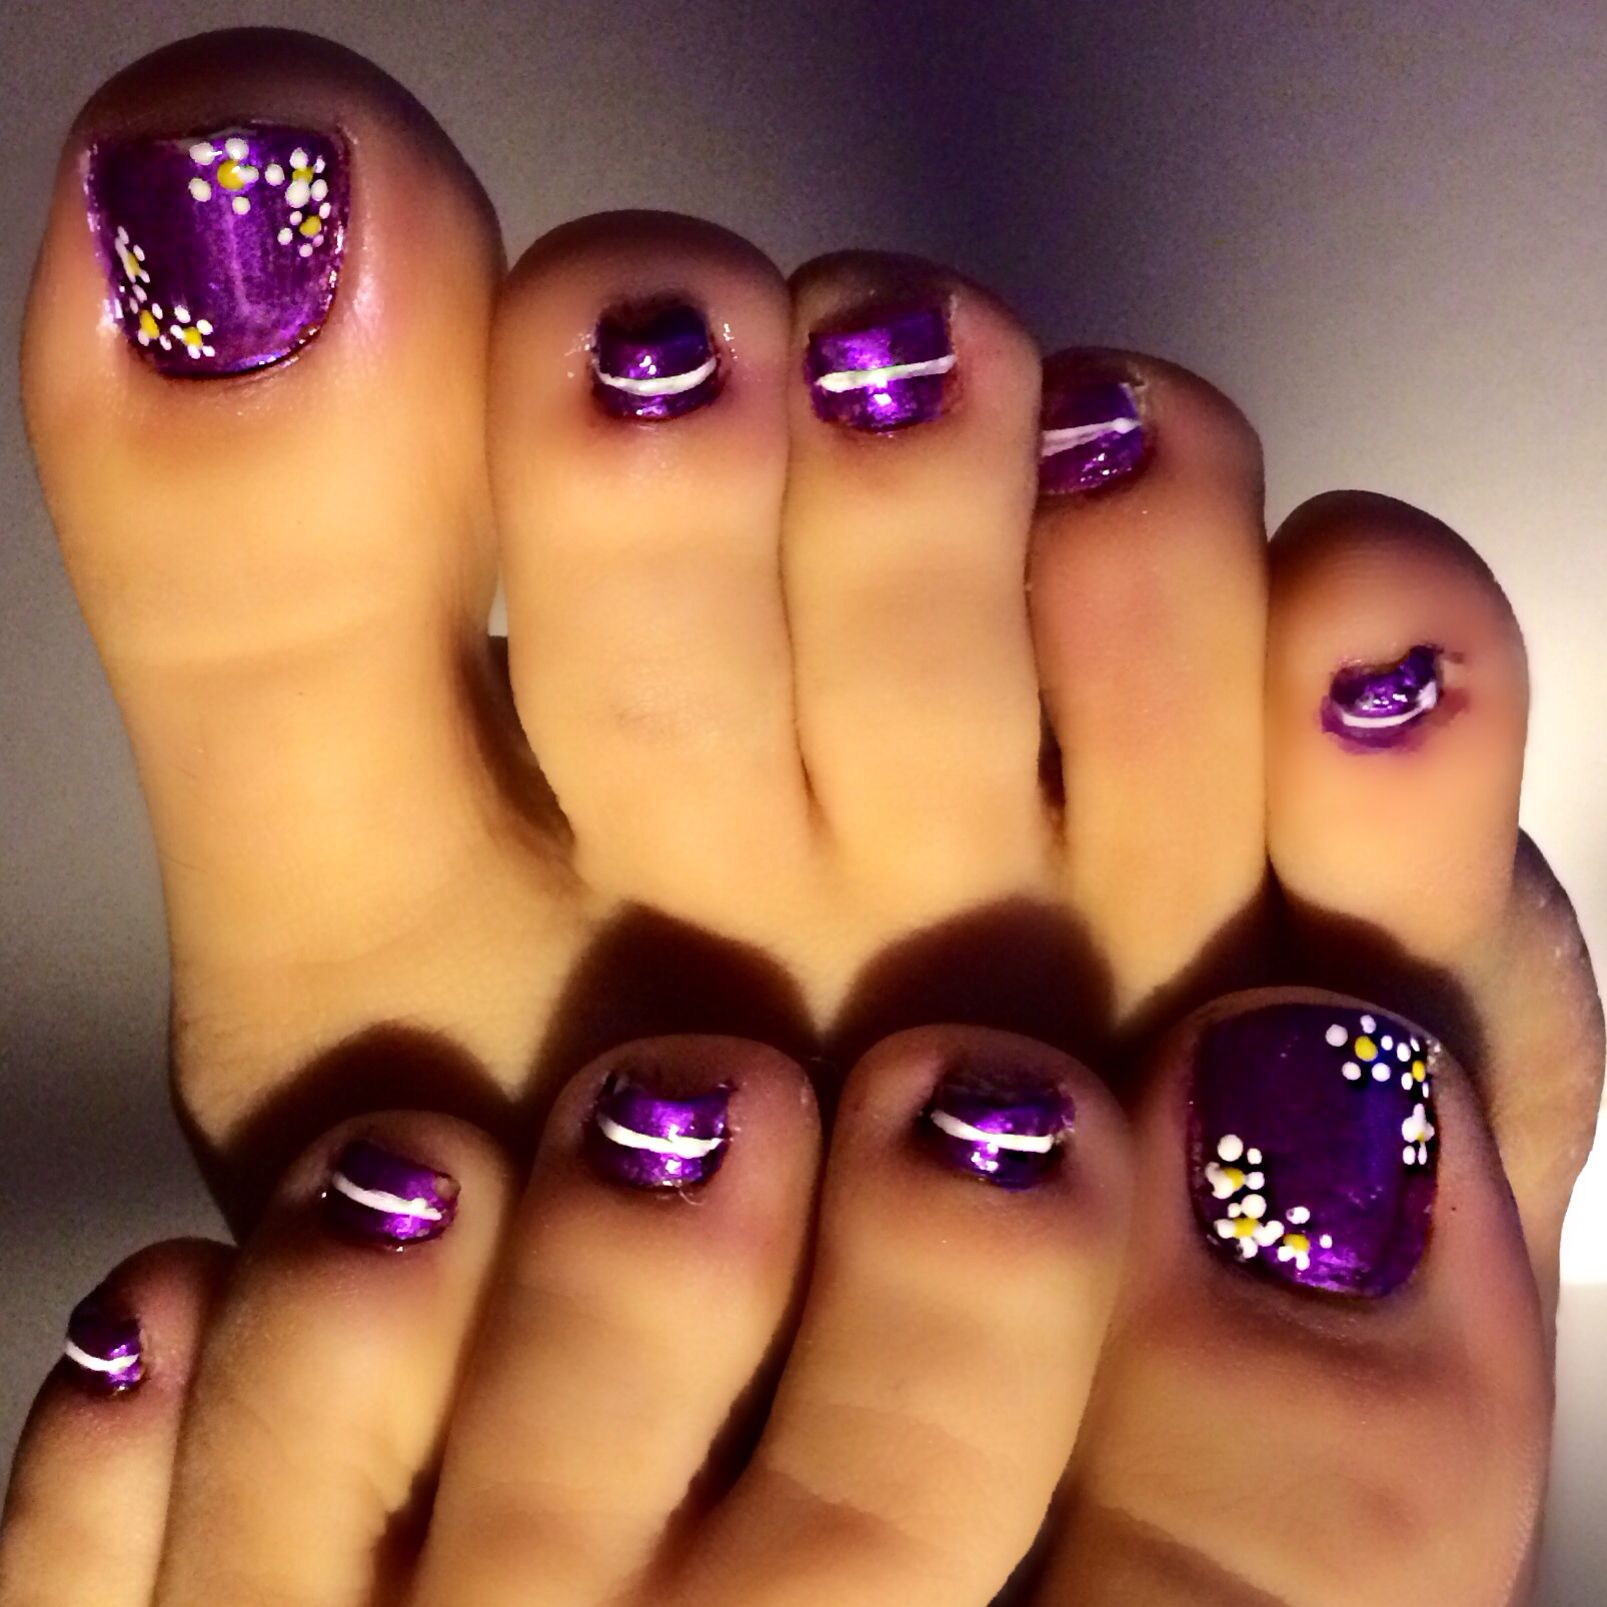 Pedicure Nail Art: Diy Pedicure. Flower Toenails. Simple Nail Art Done With A